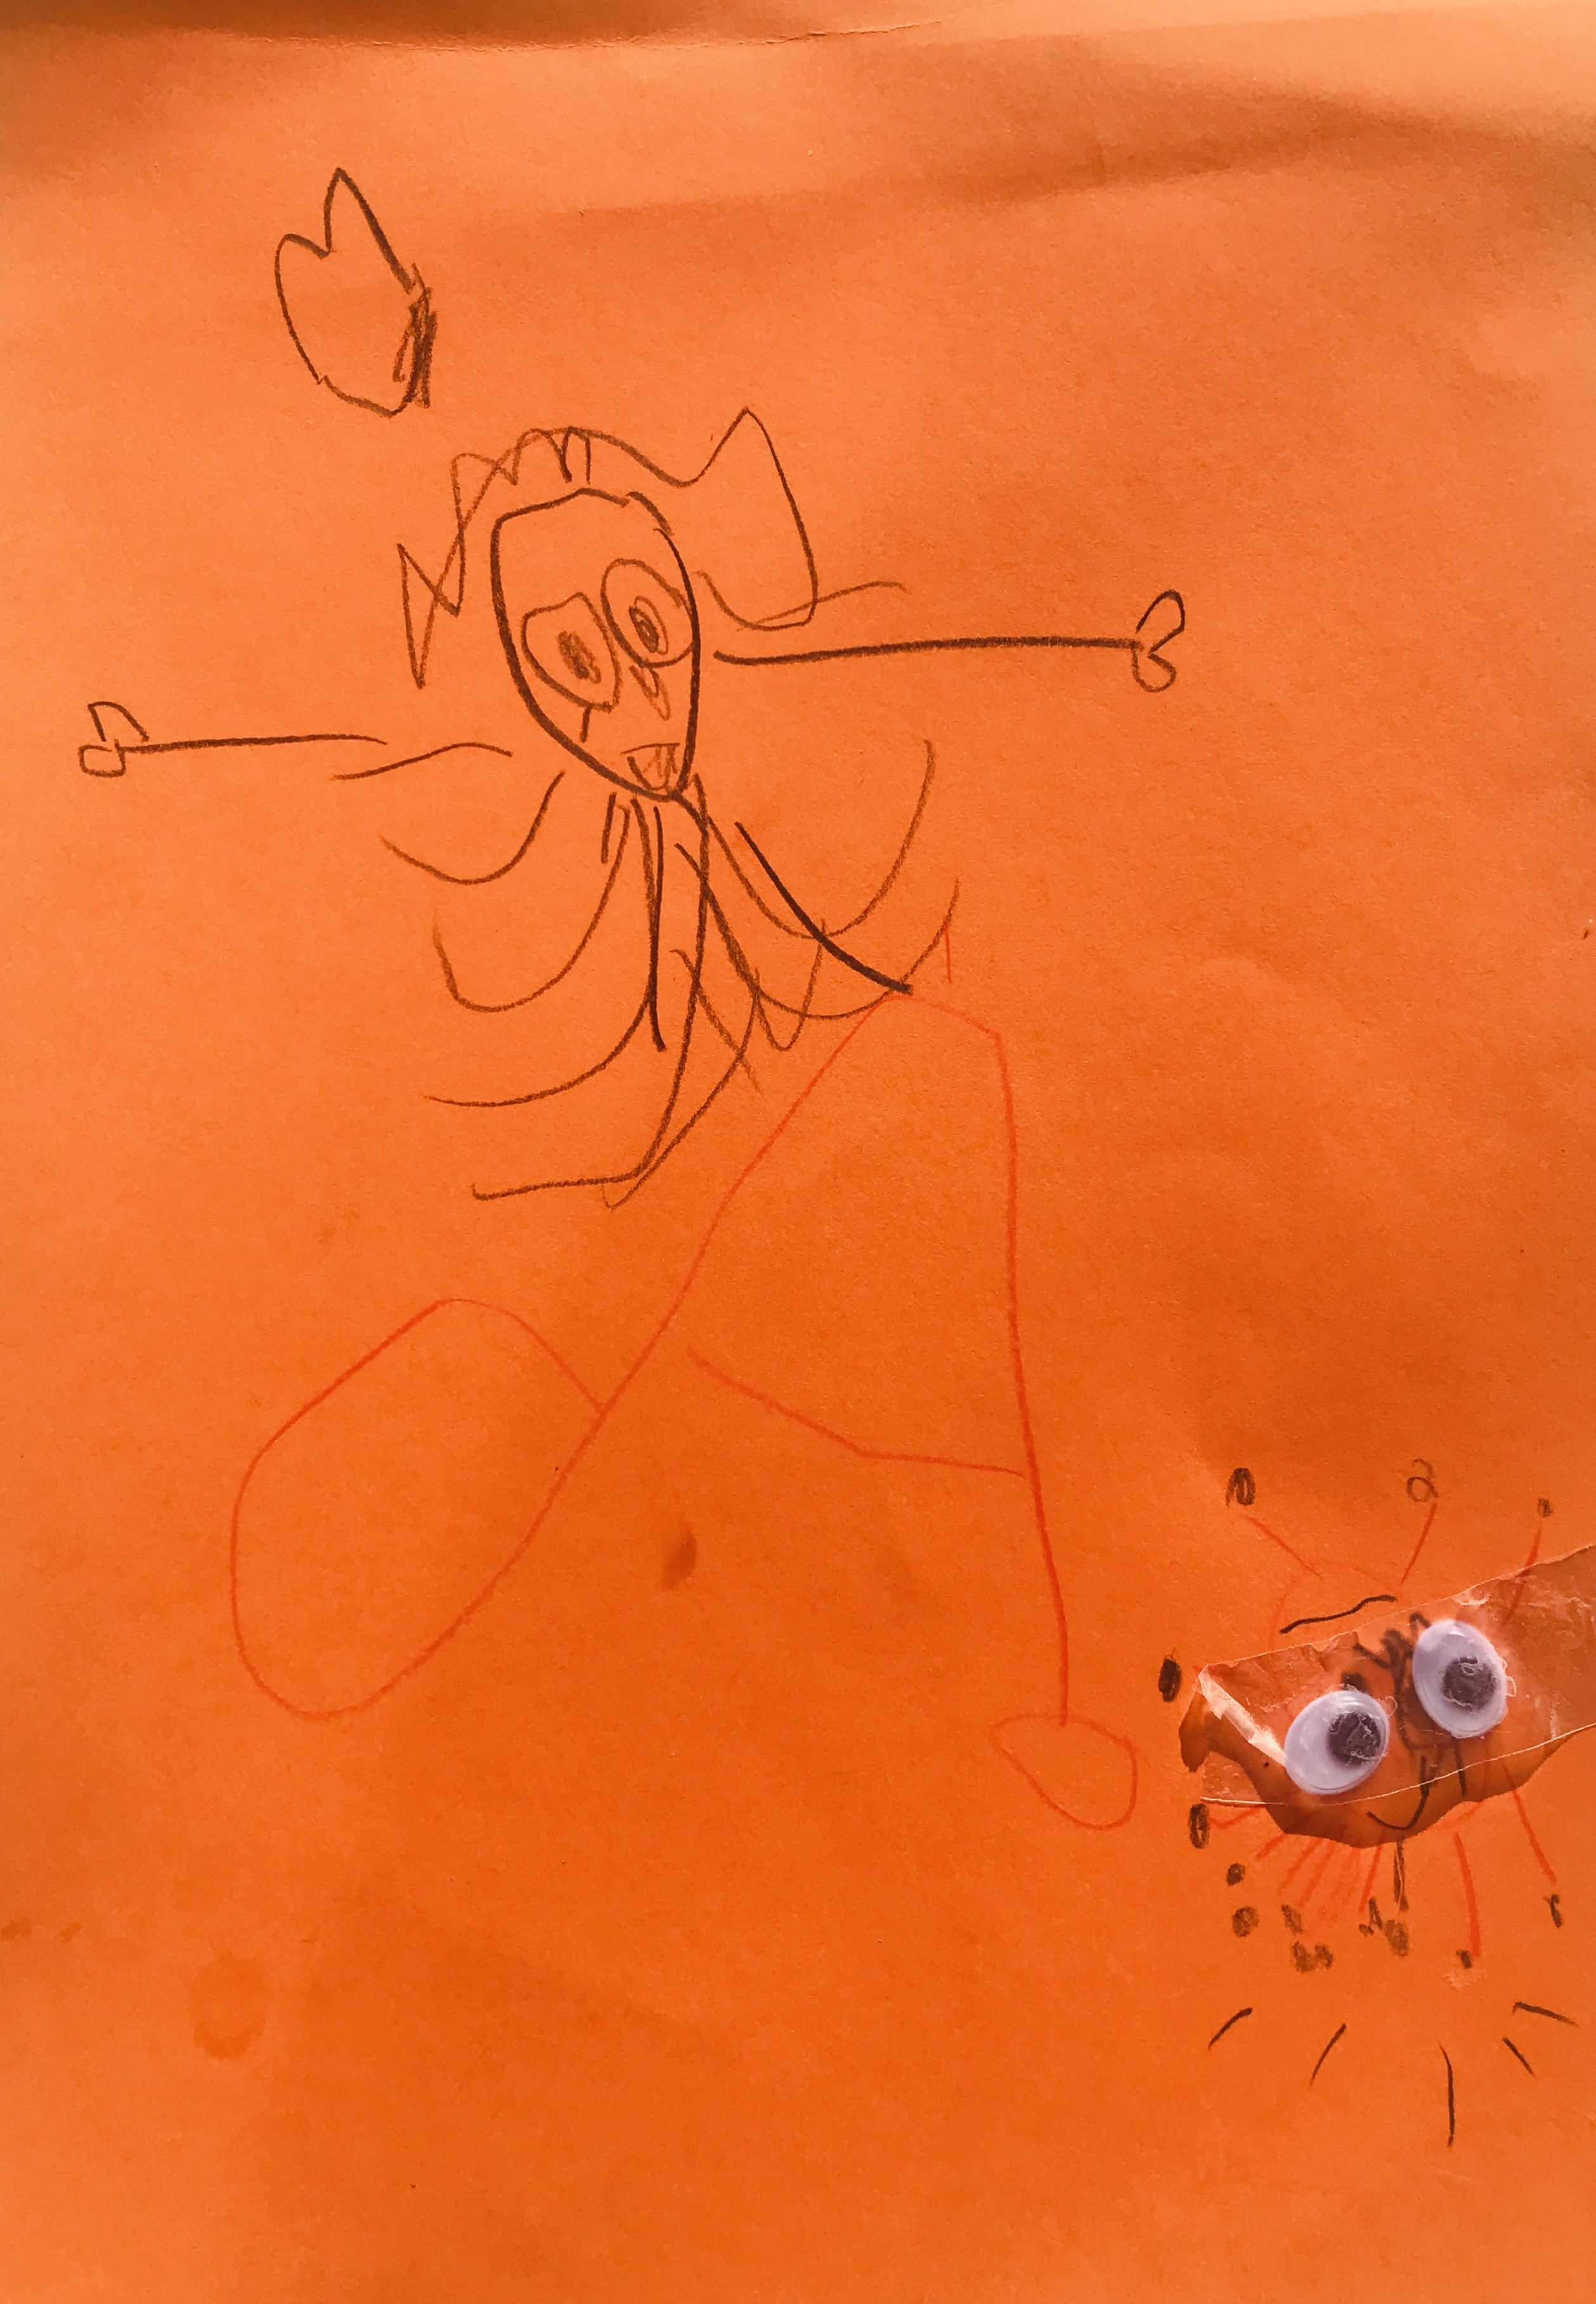 Age 4, Norway